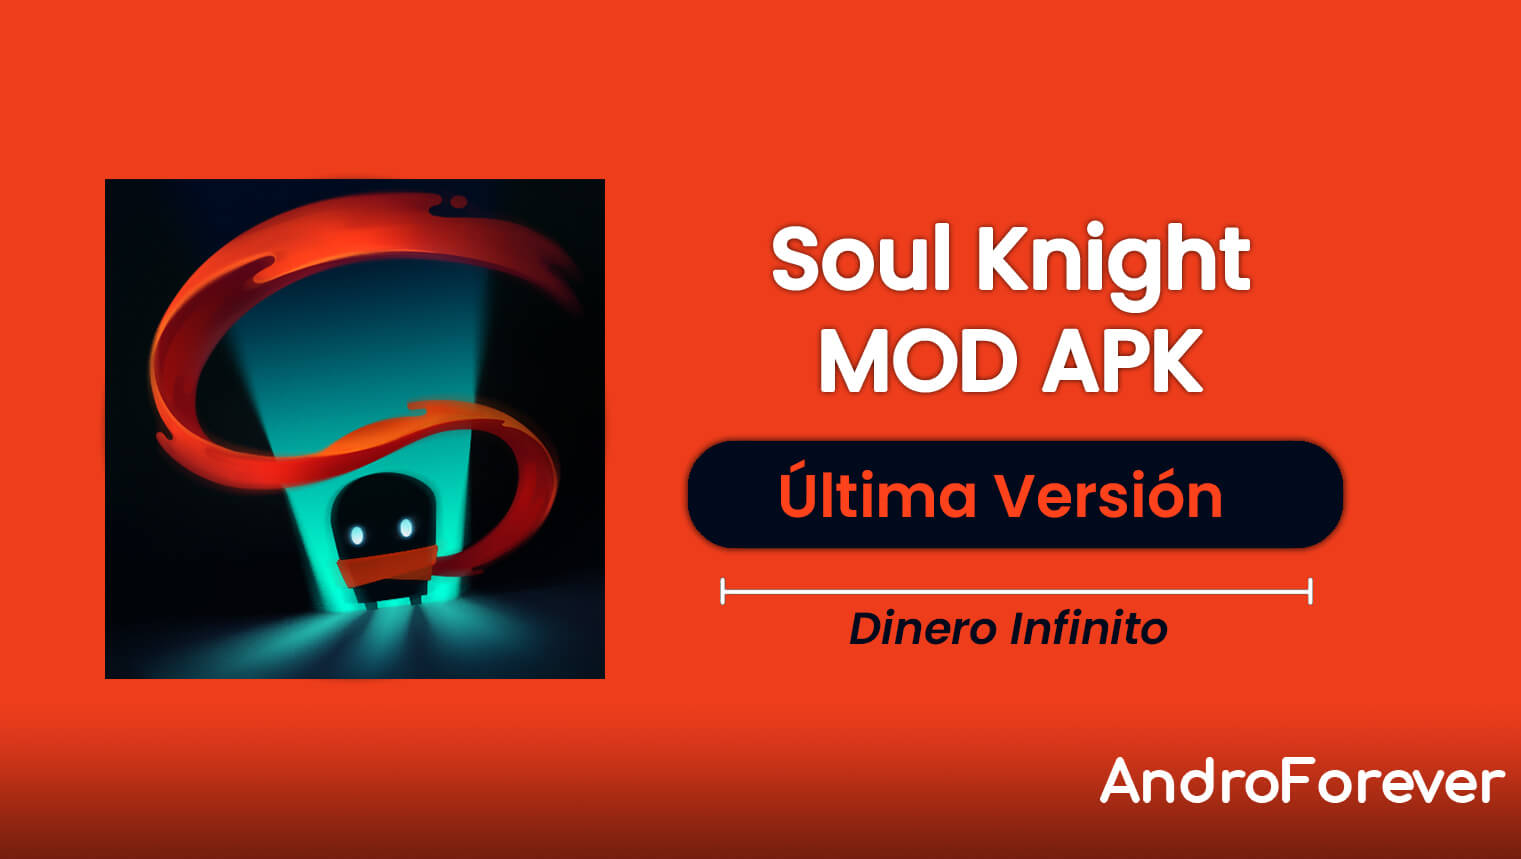 Soul Knight APK 3.2.3 (MOD, Dinero ilimitado)